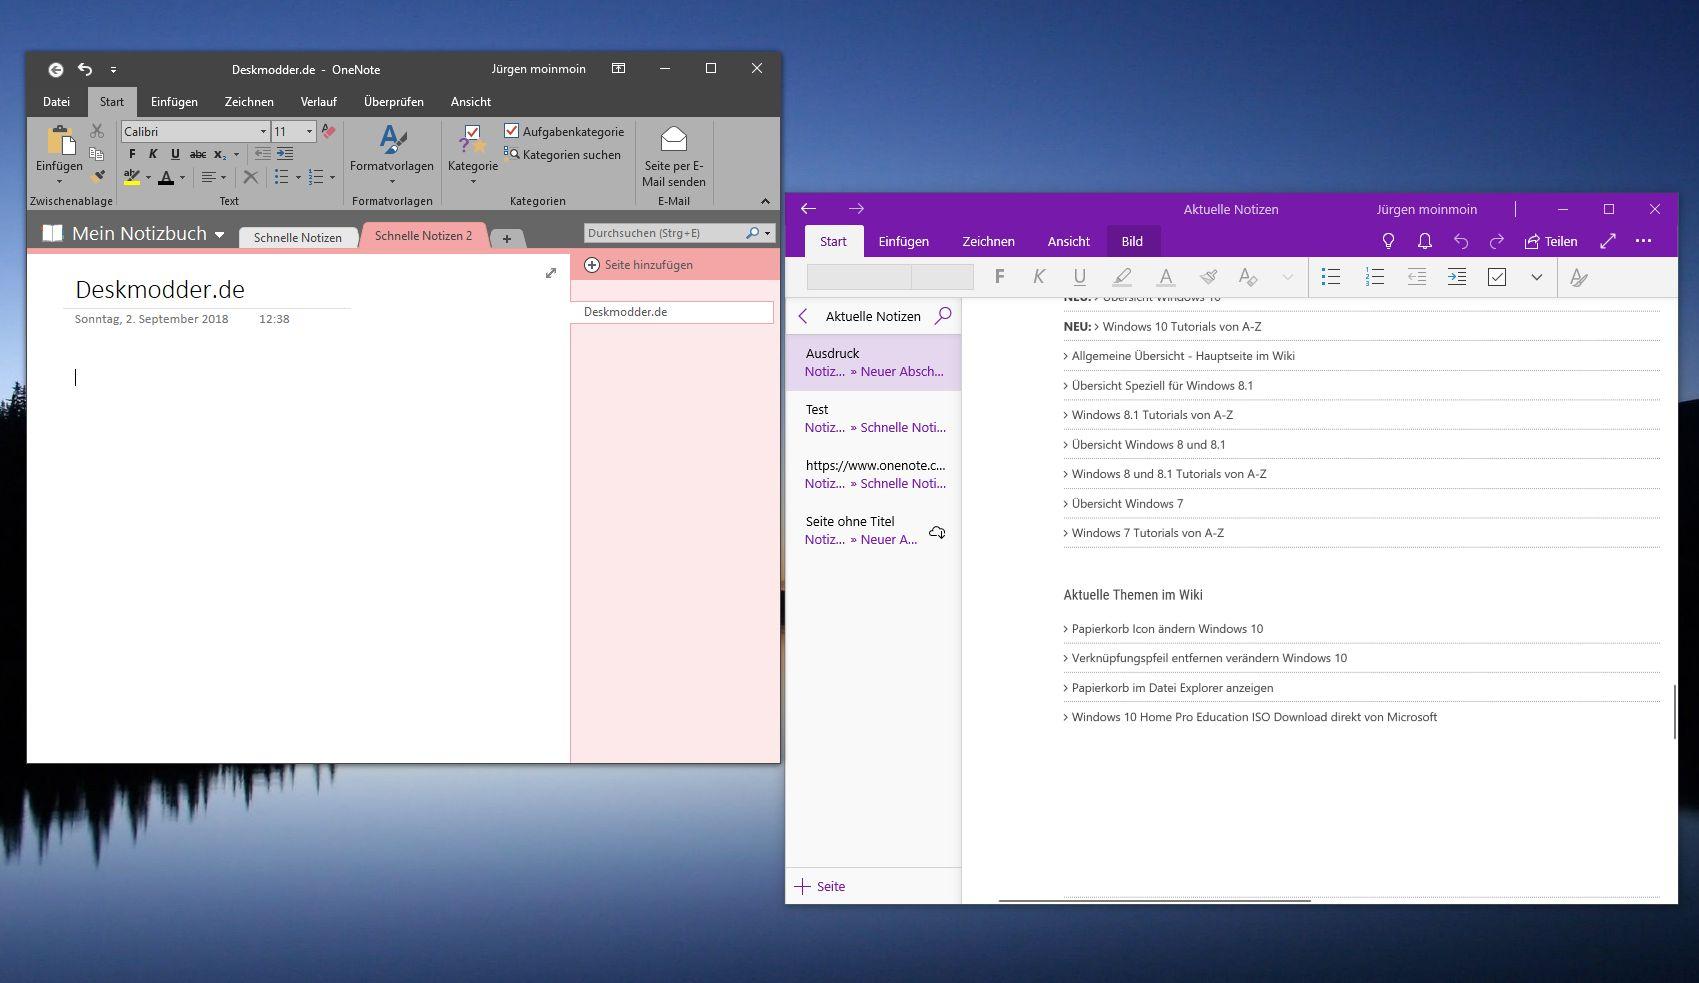 onenote 2016 download 32 bit